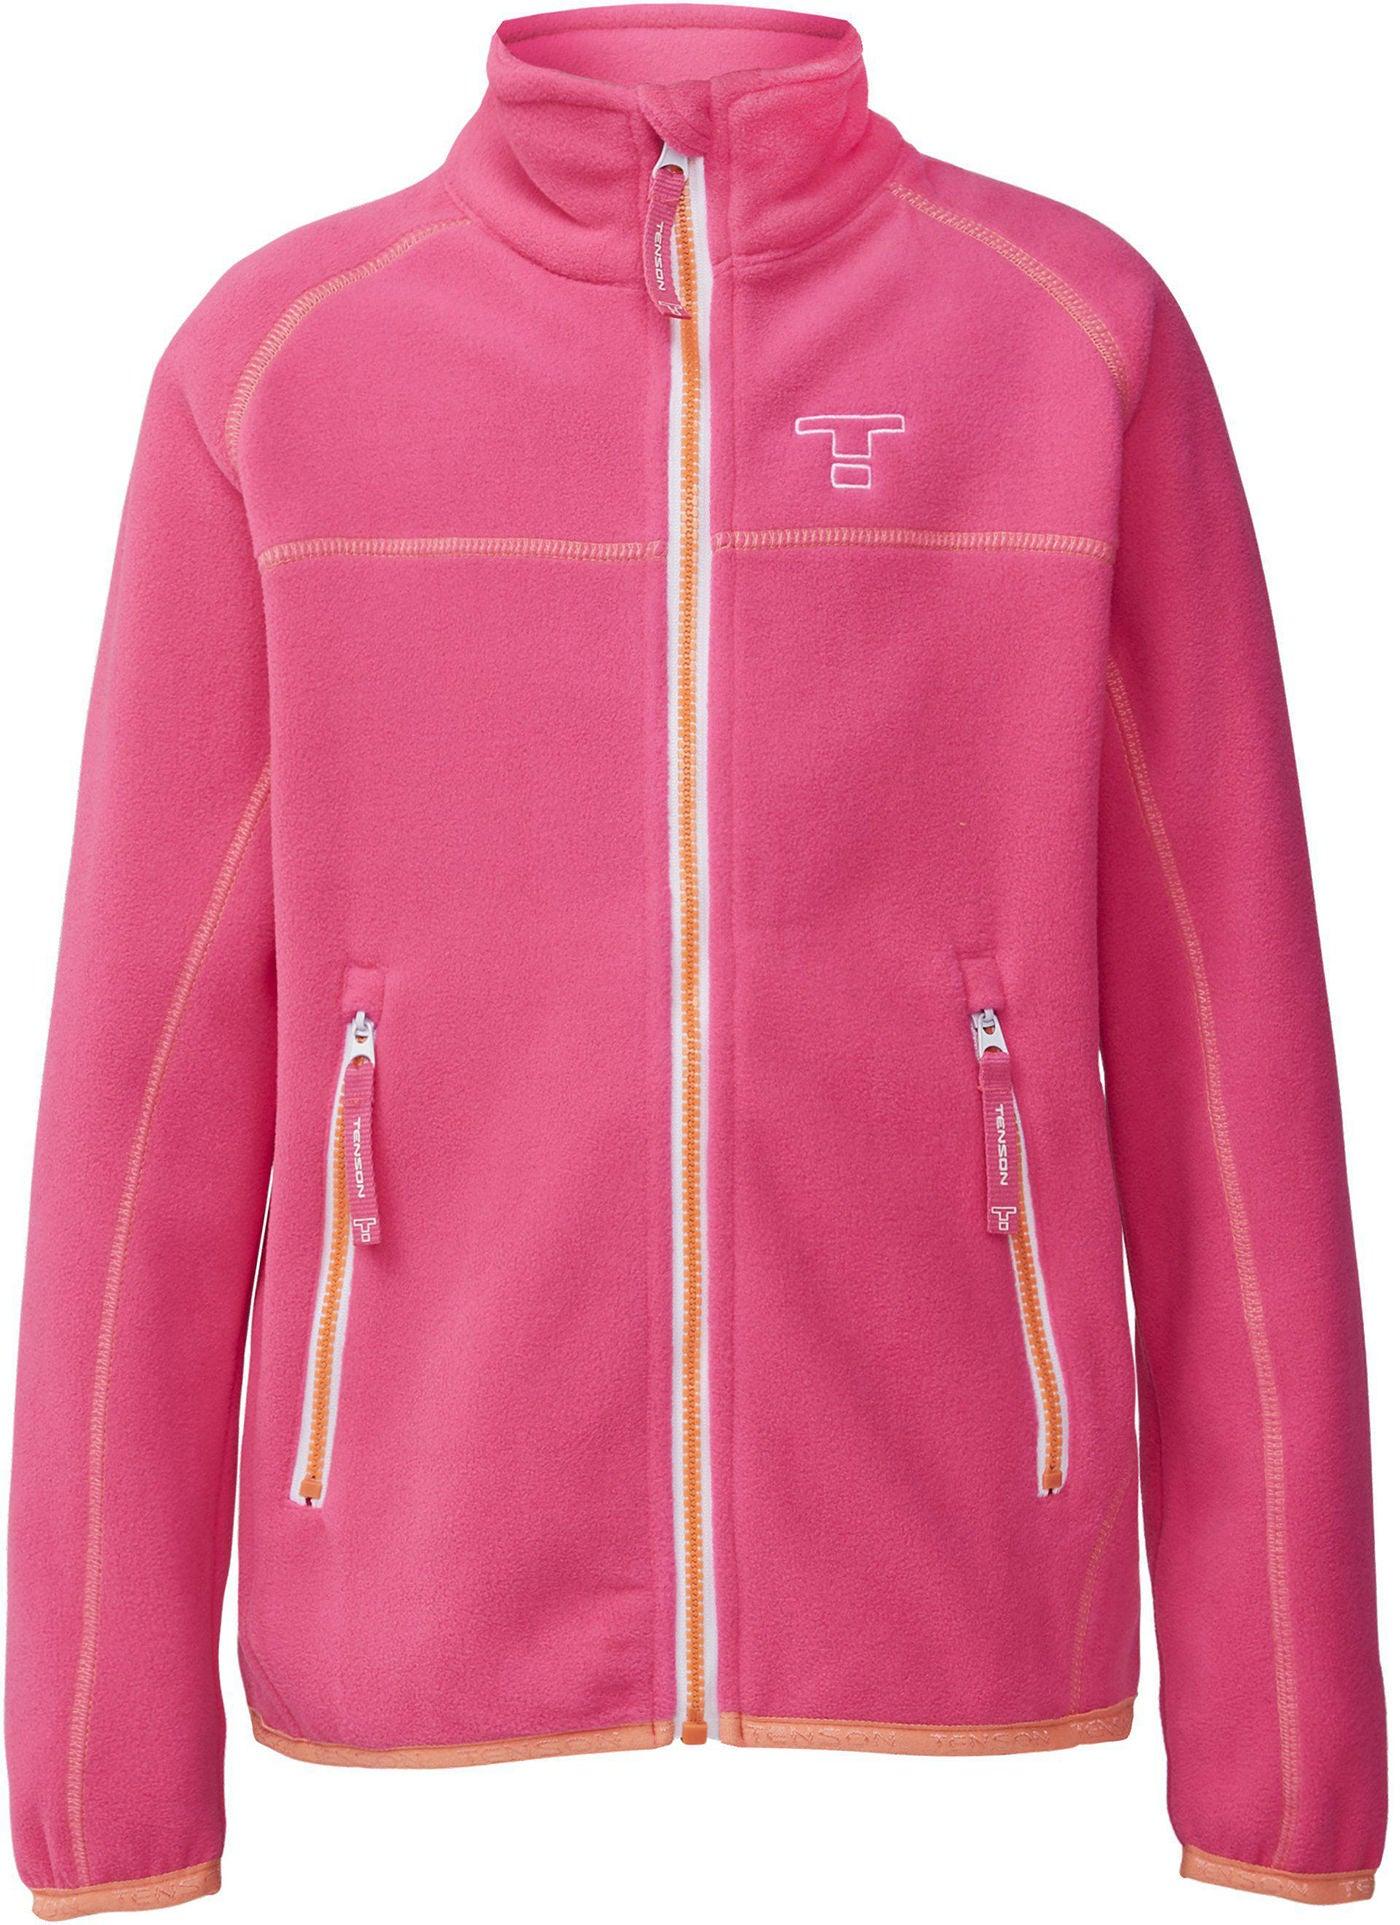 Tenson Moment Fleece, Pink 146-152